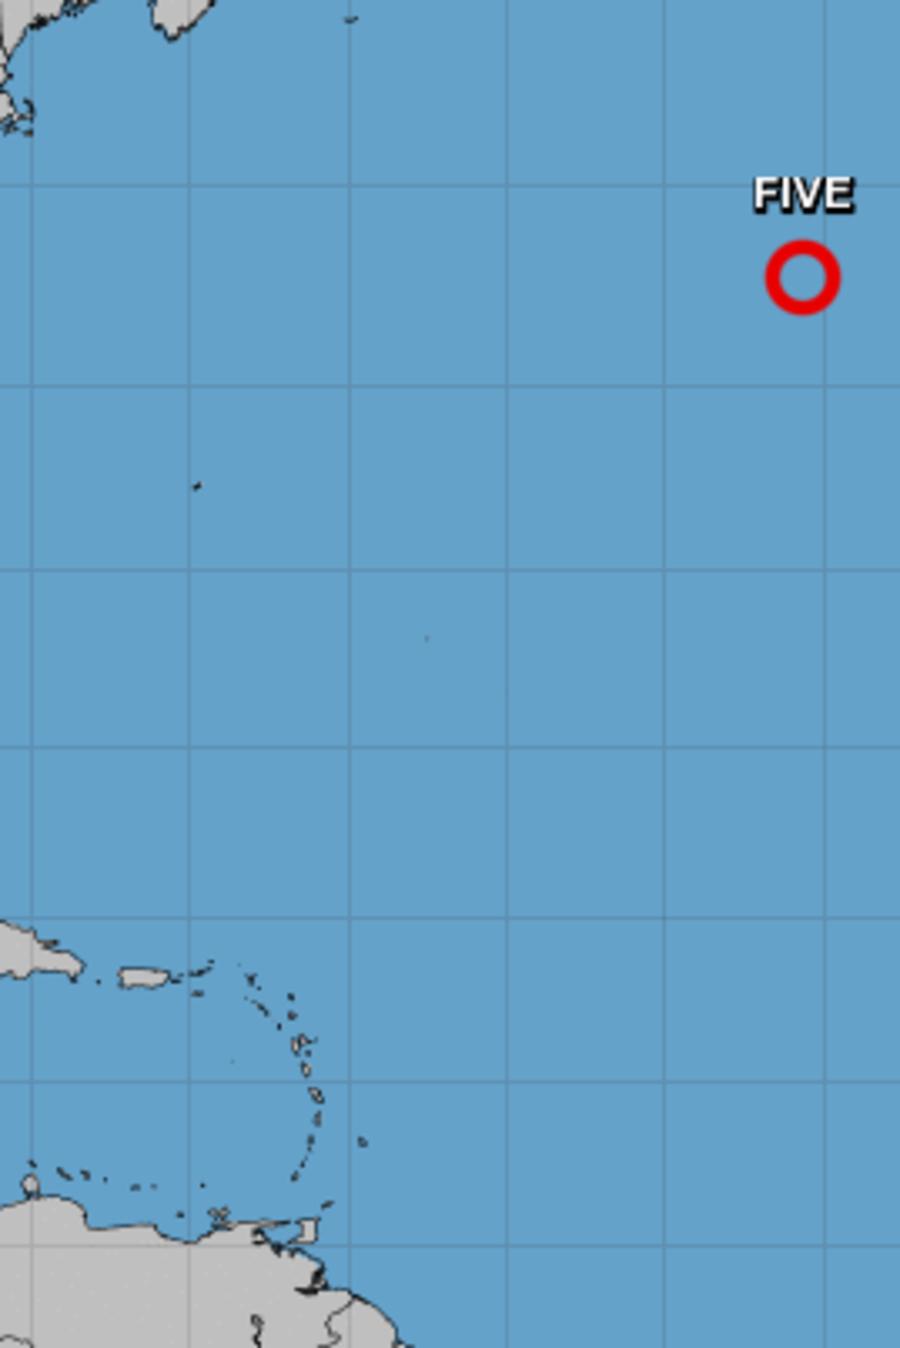 Se espera que se convierta en una tormenta subtropical este miércoles.